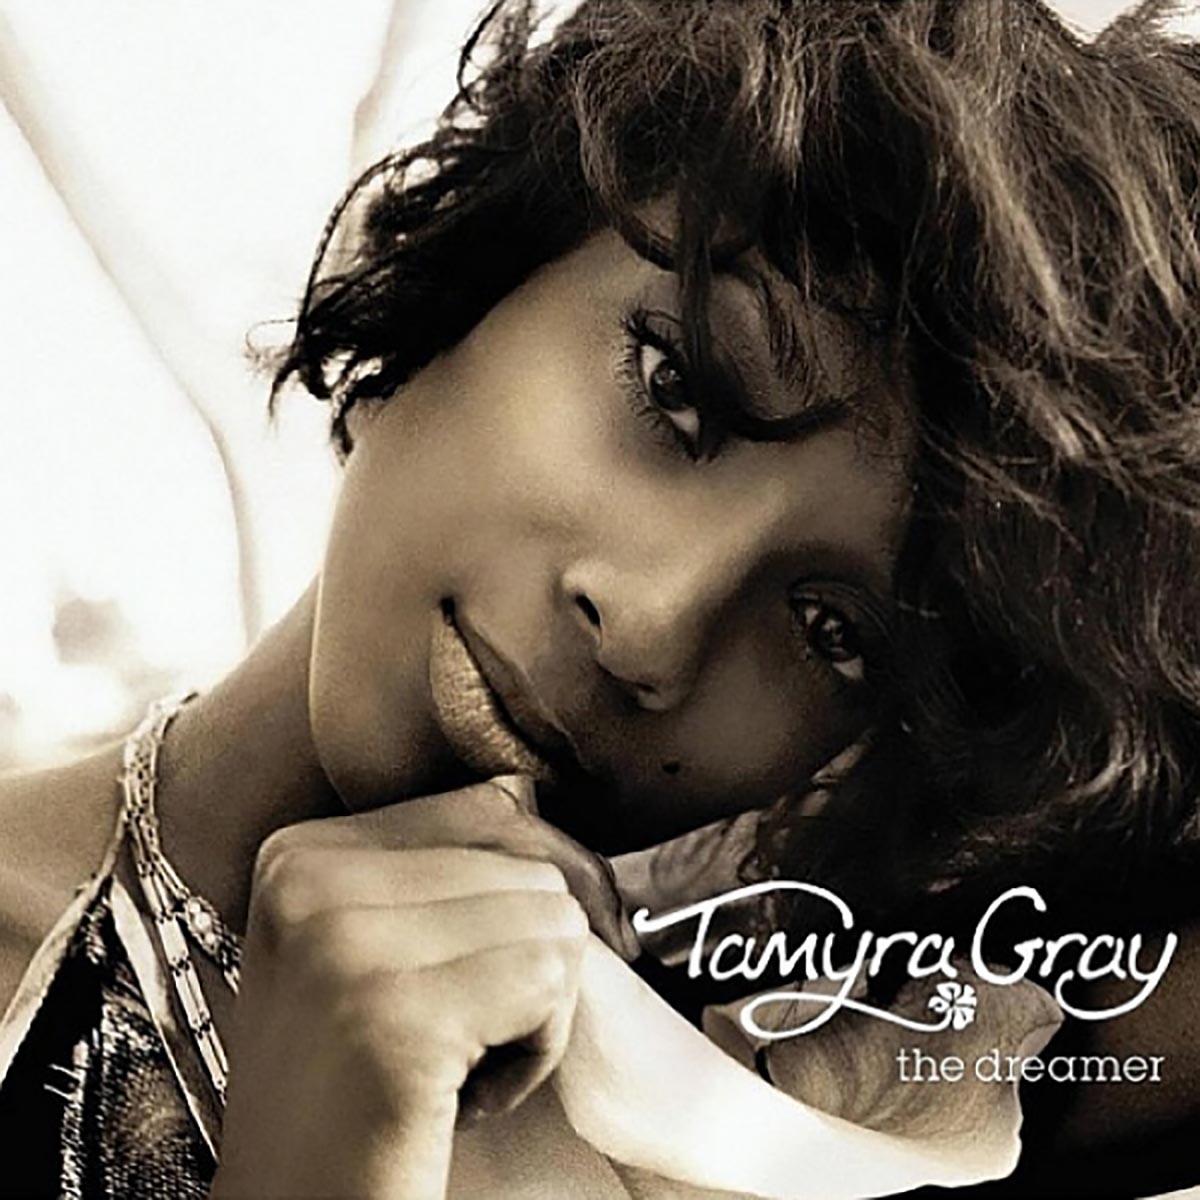 Tamyra Gray, The Dreamer